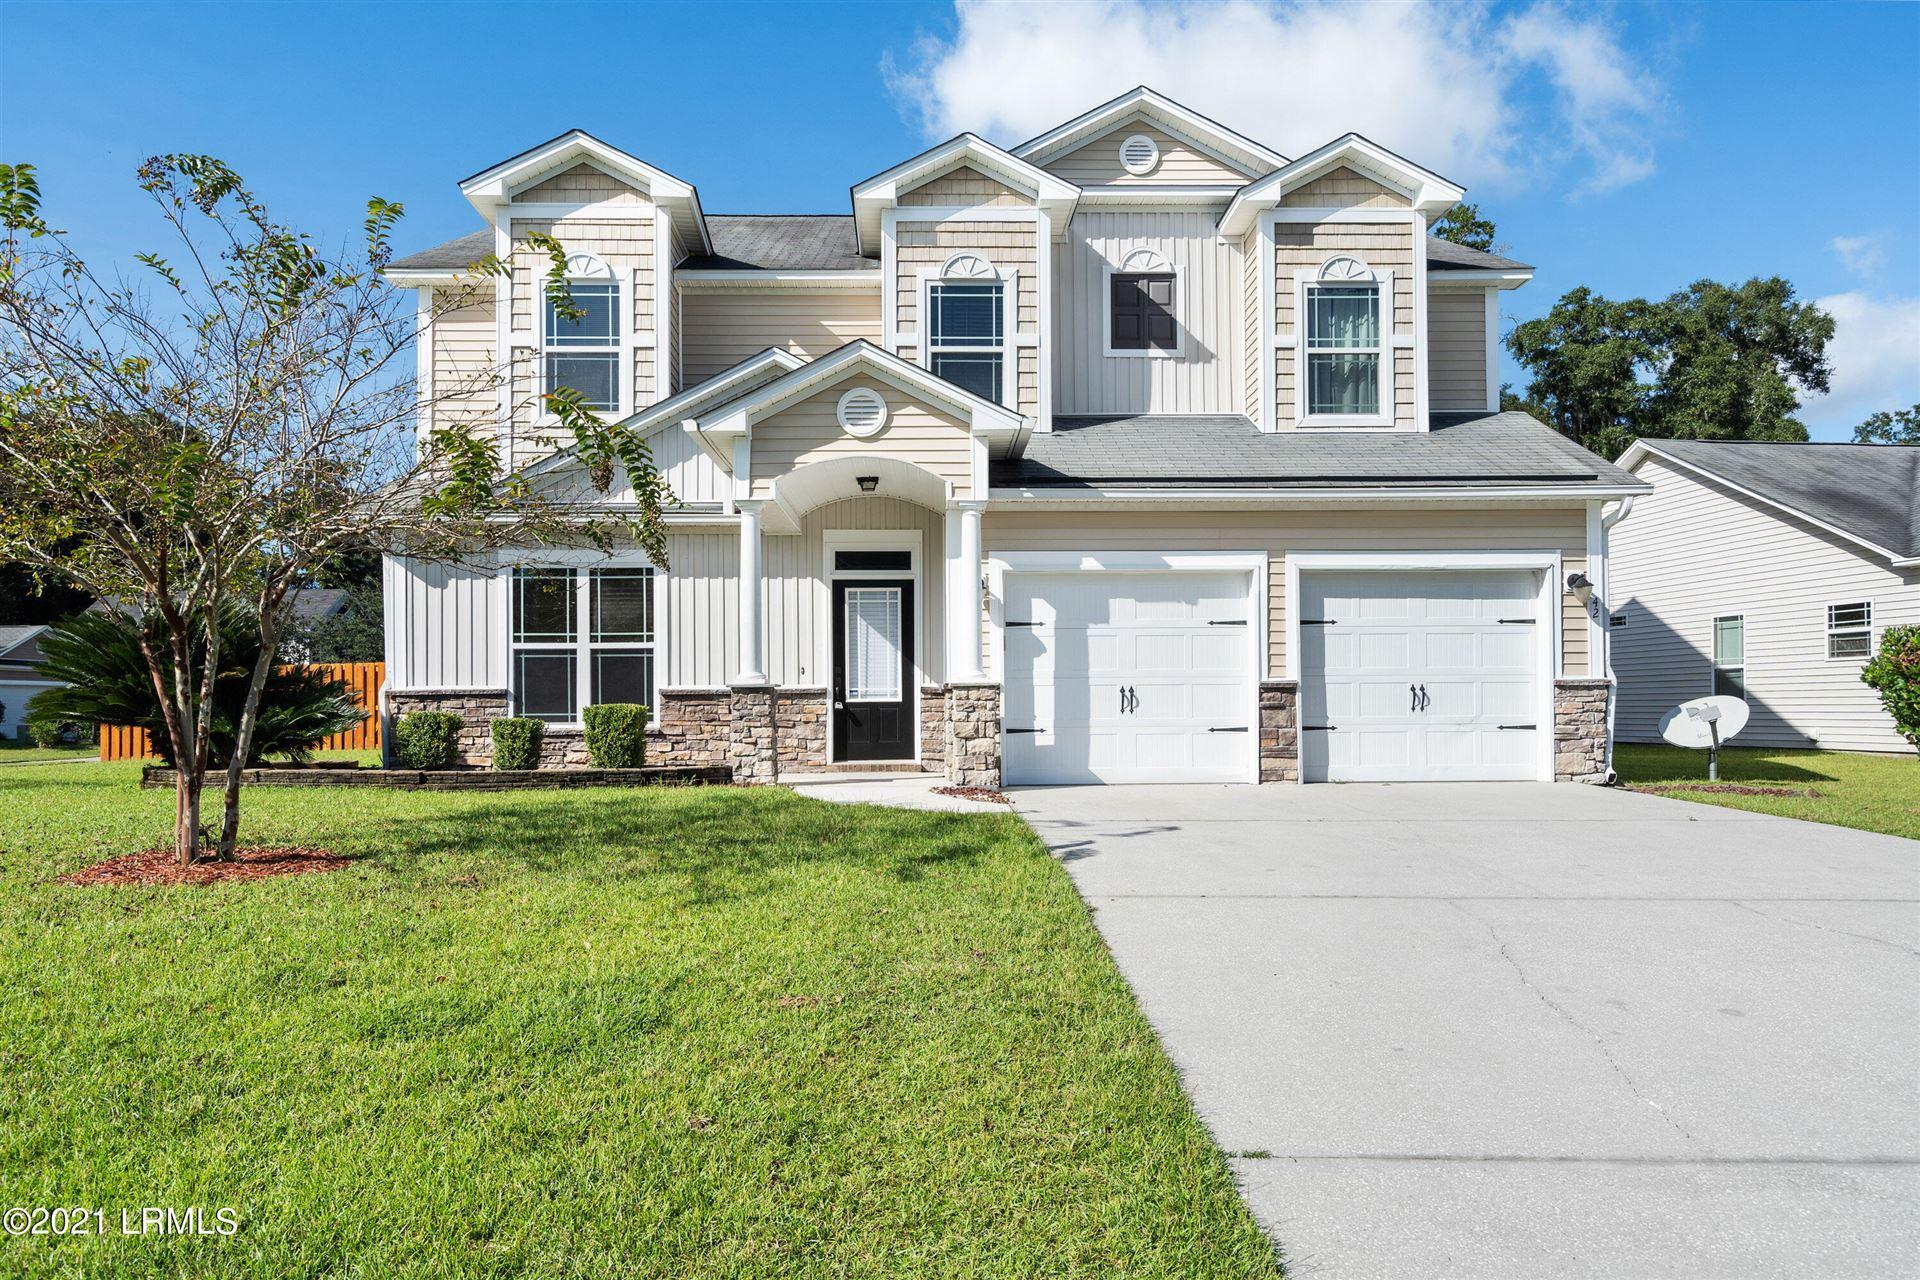 42 Sago Palm Drive, Bluffton, SC 29910 - MLS#: 173270